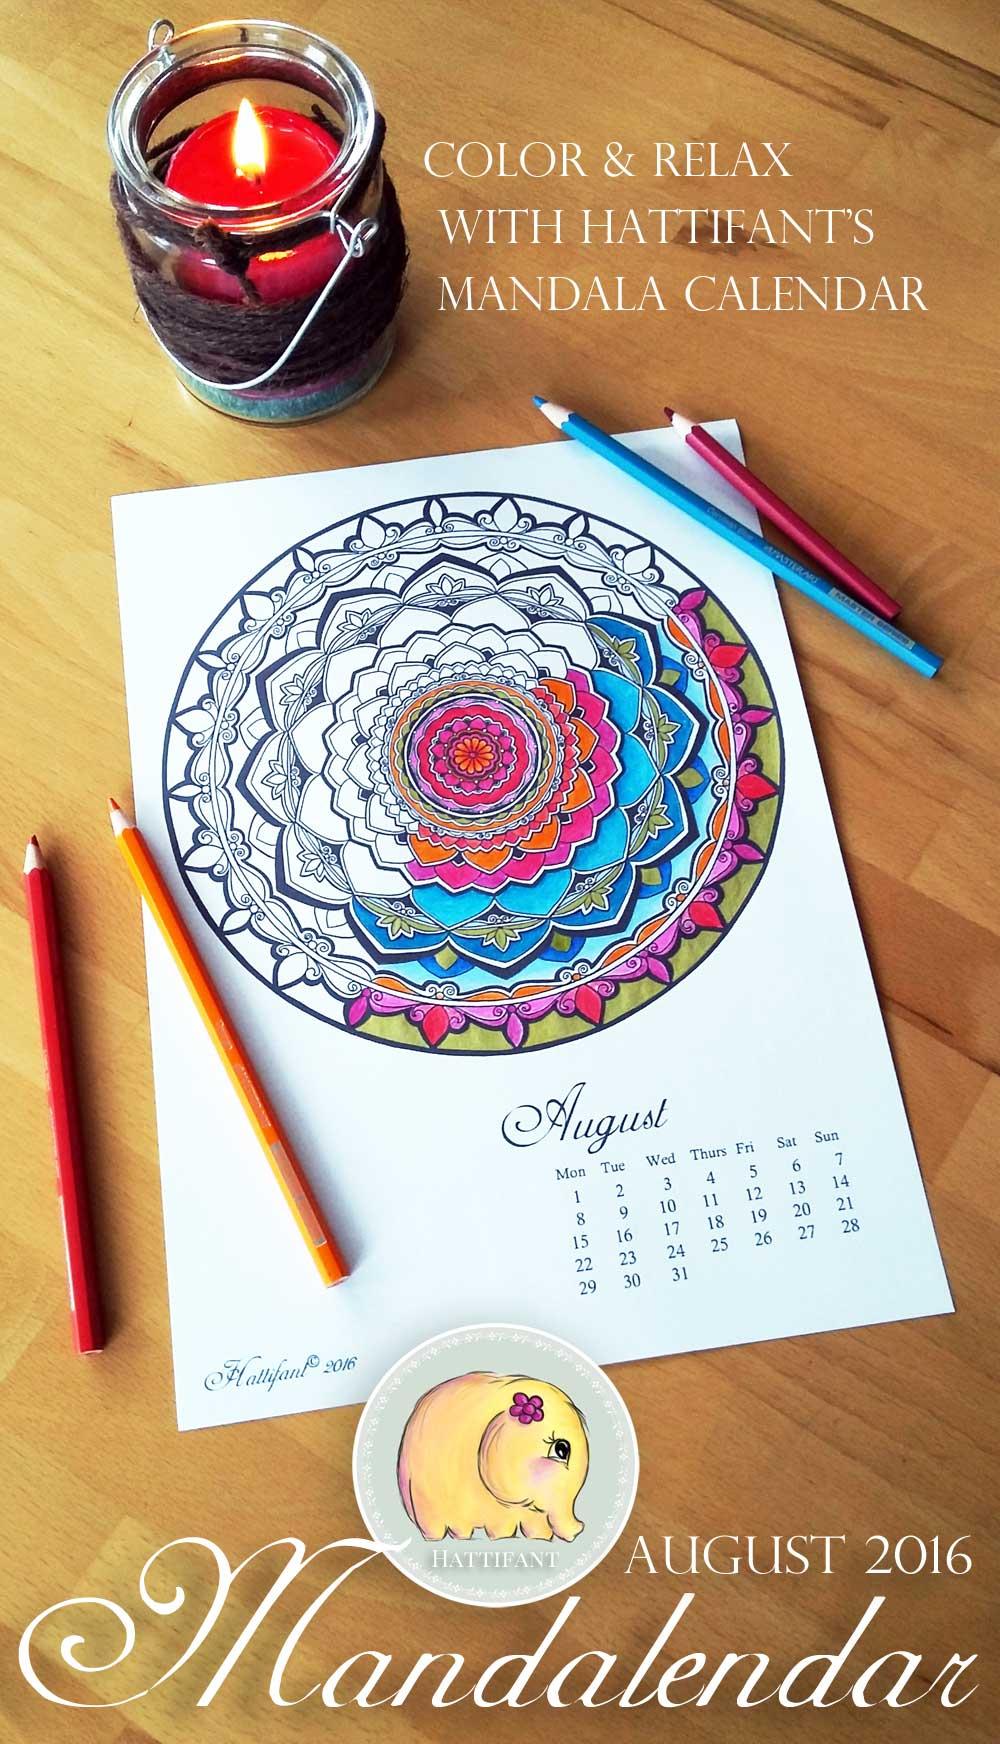 Hattifant Mandalendar Calendar Coloring Page 2016 August